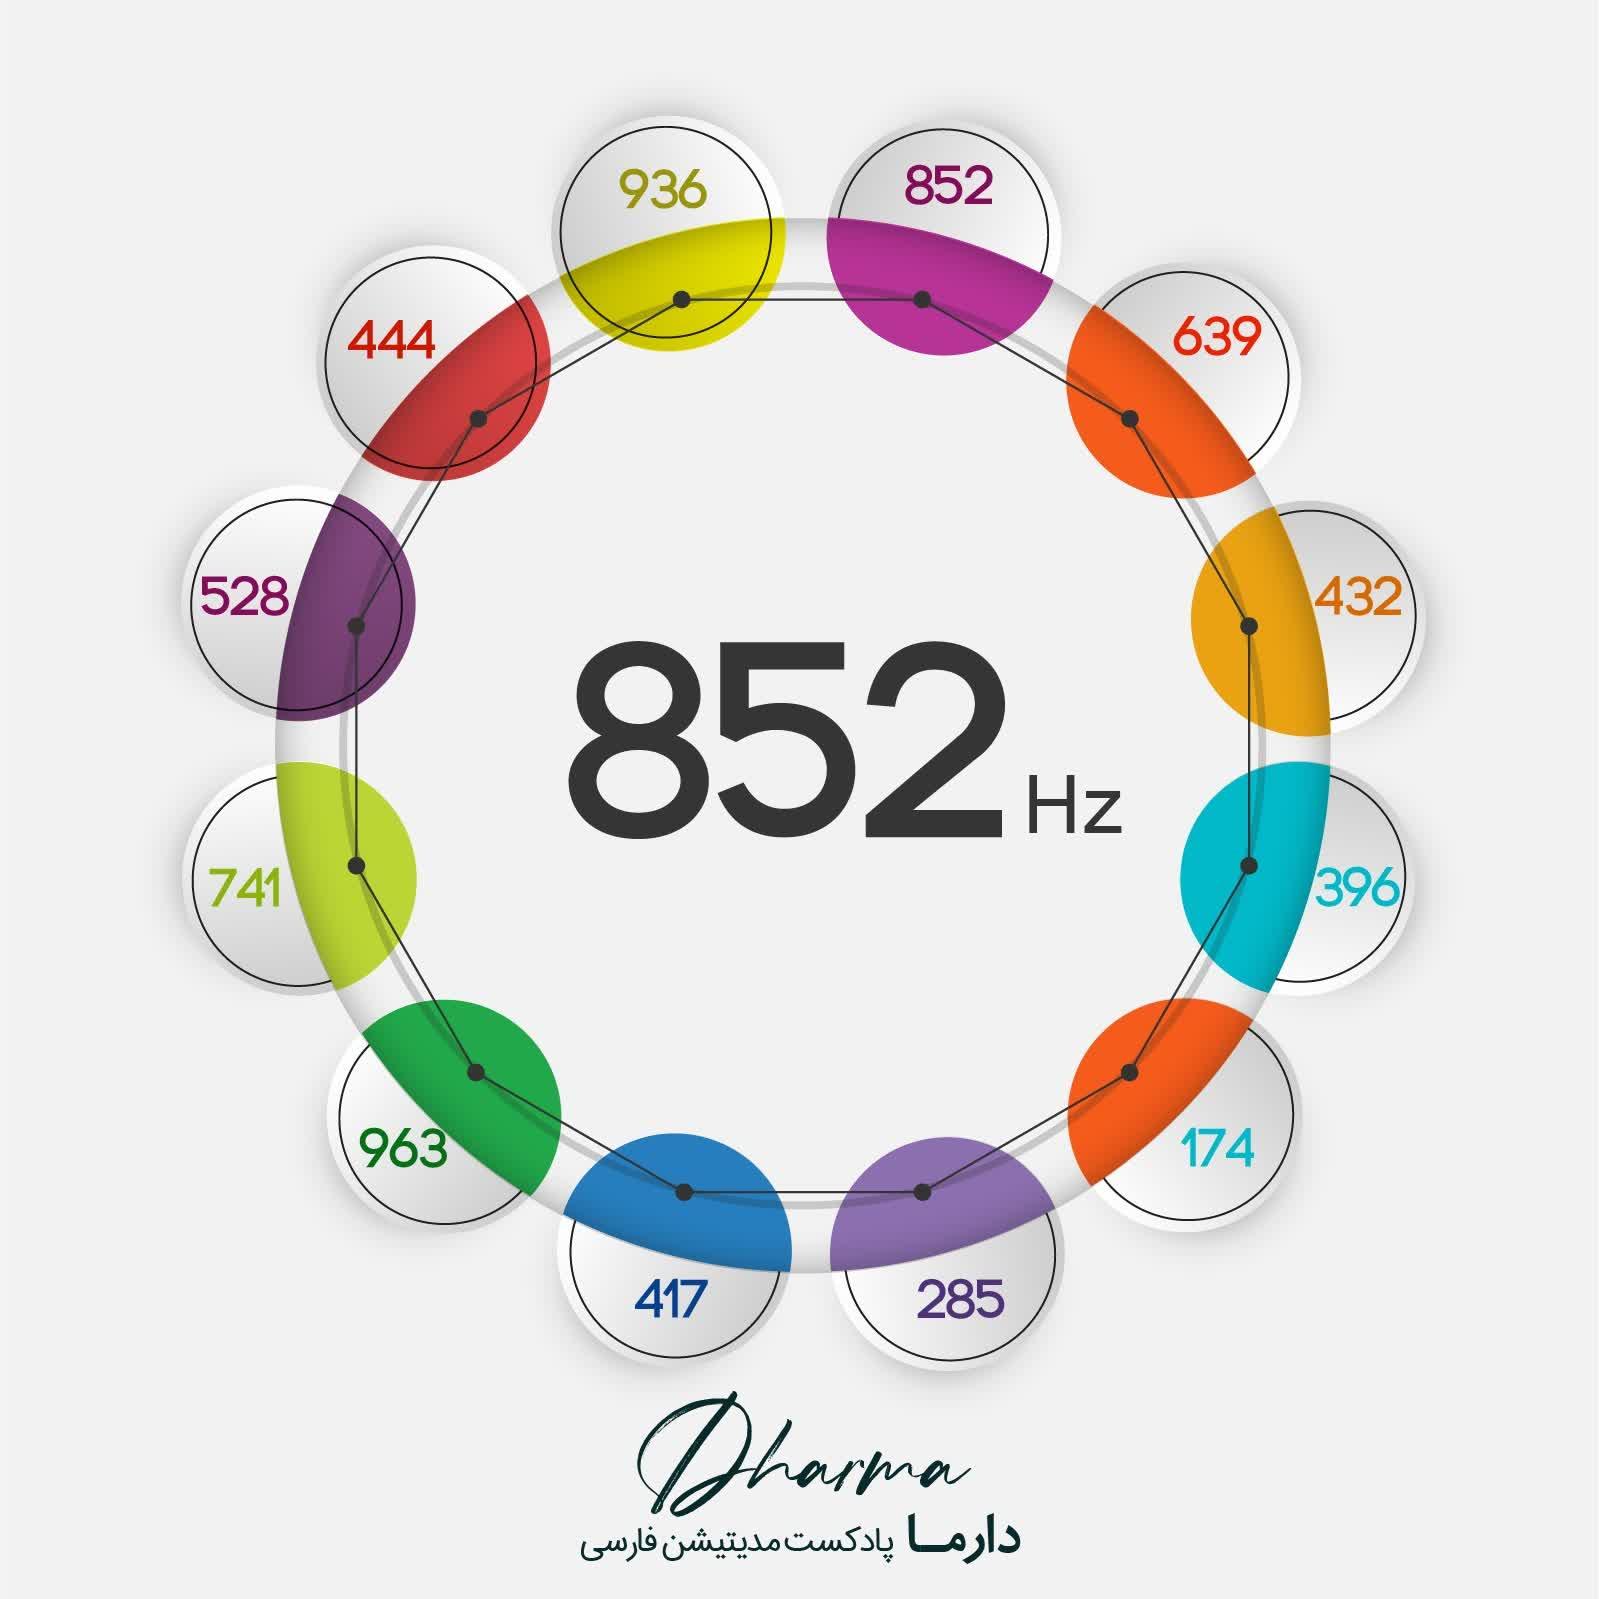 852Hz - فرکانس 852 هرتز